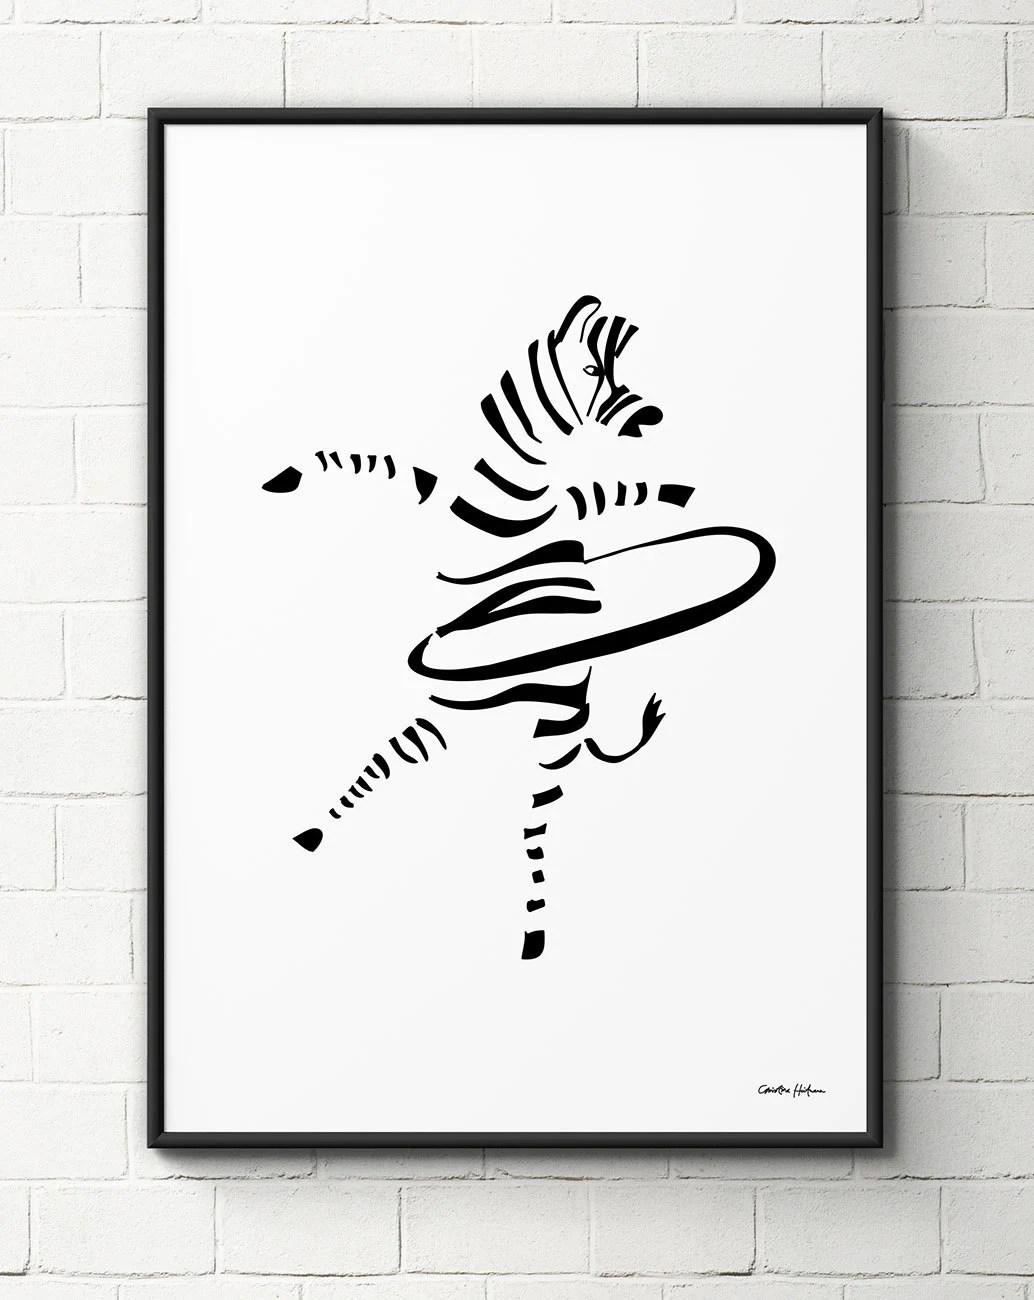 Hula Hoop Zebra Poster Ts For Kids Stocking Stuffers